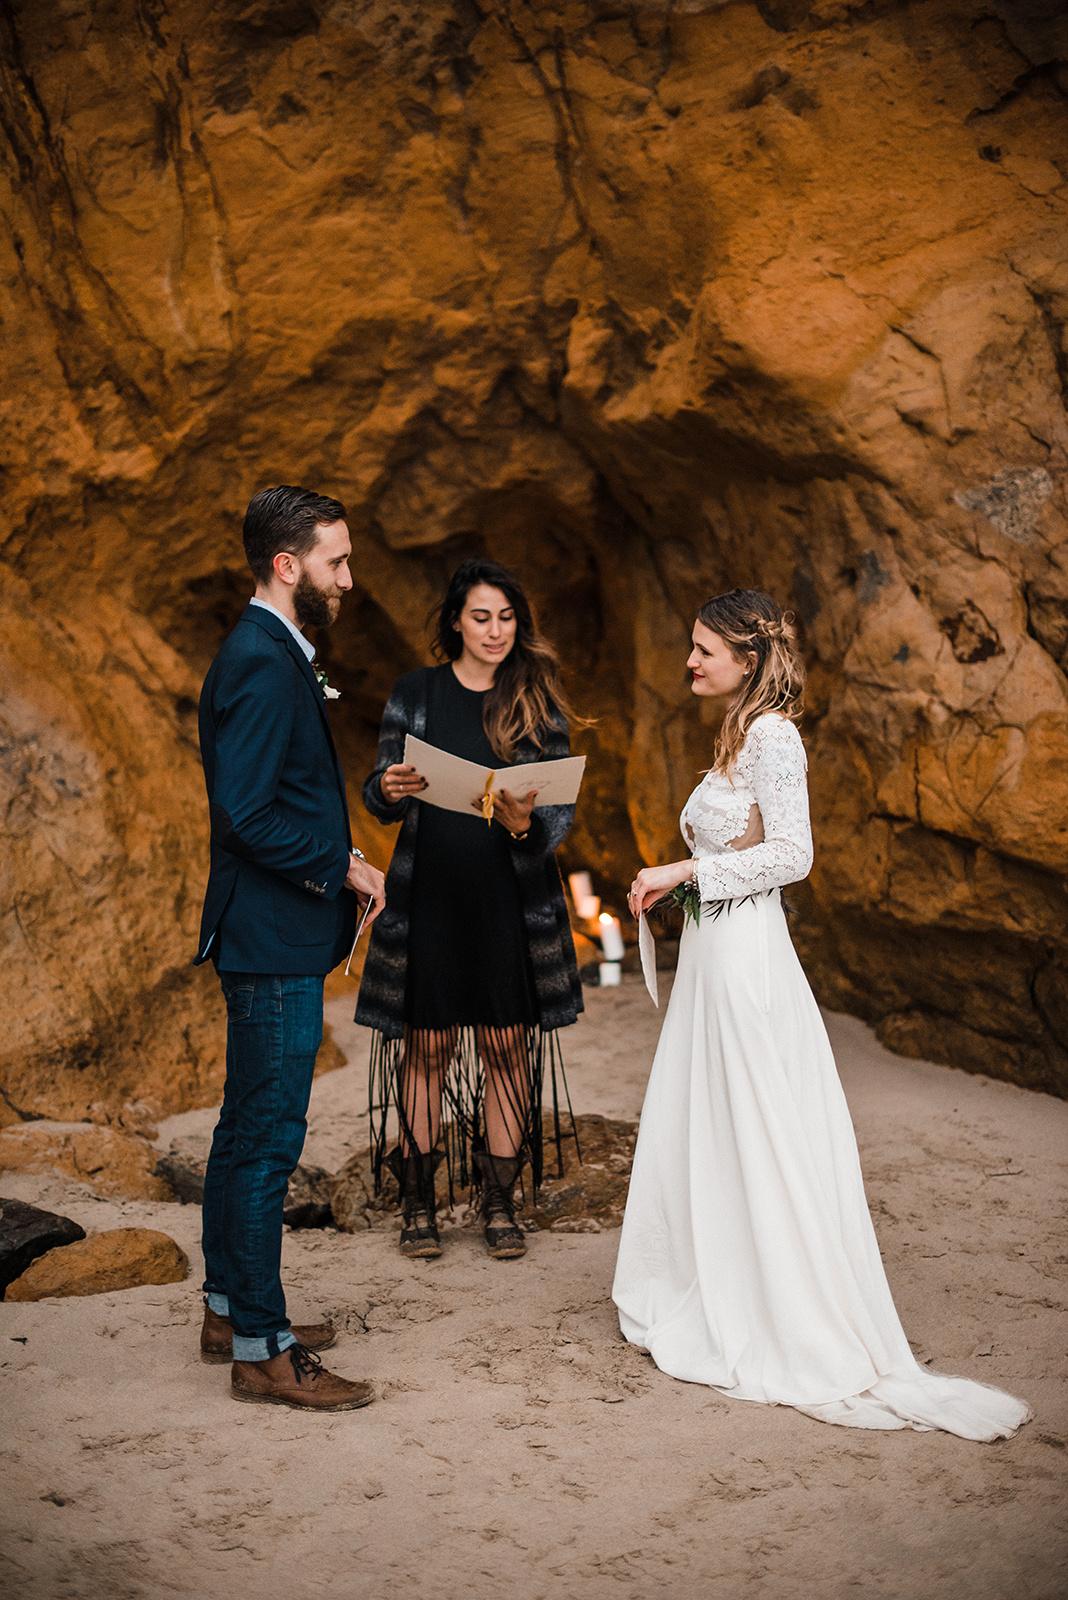 Oregon_Coast_Elopement_Wedding_The_Foxes_Photography_139.jpg